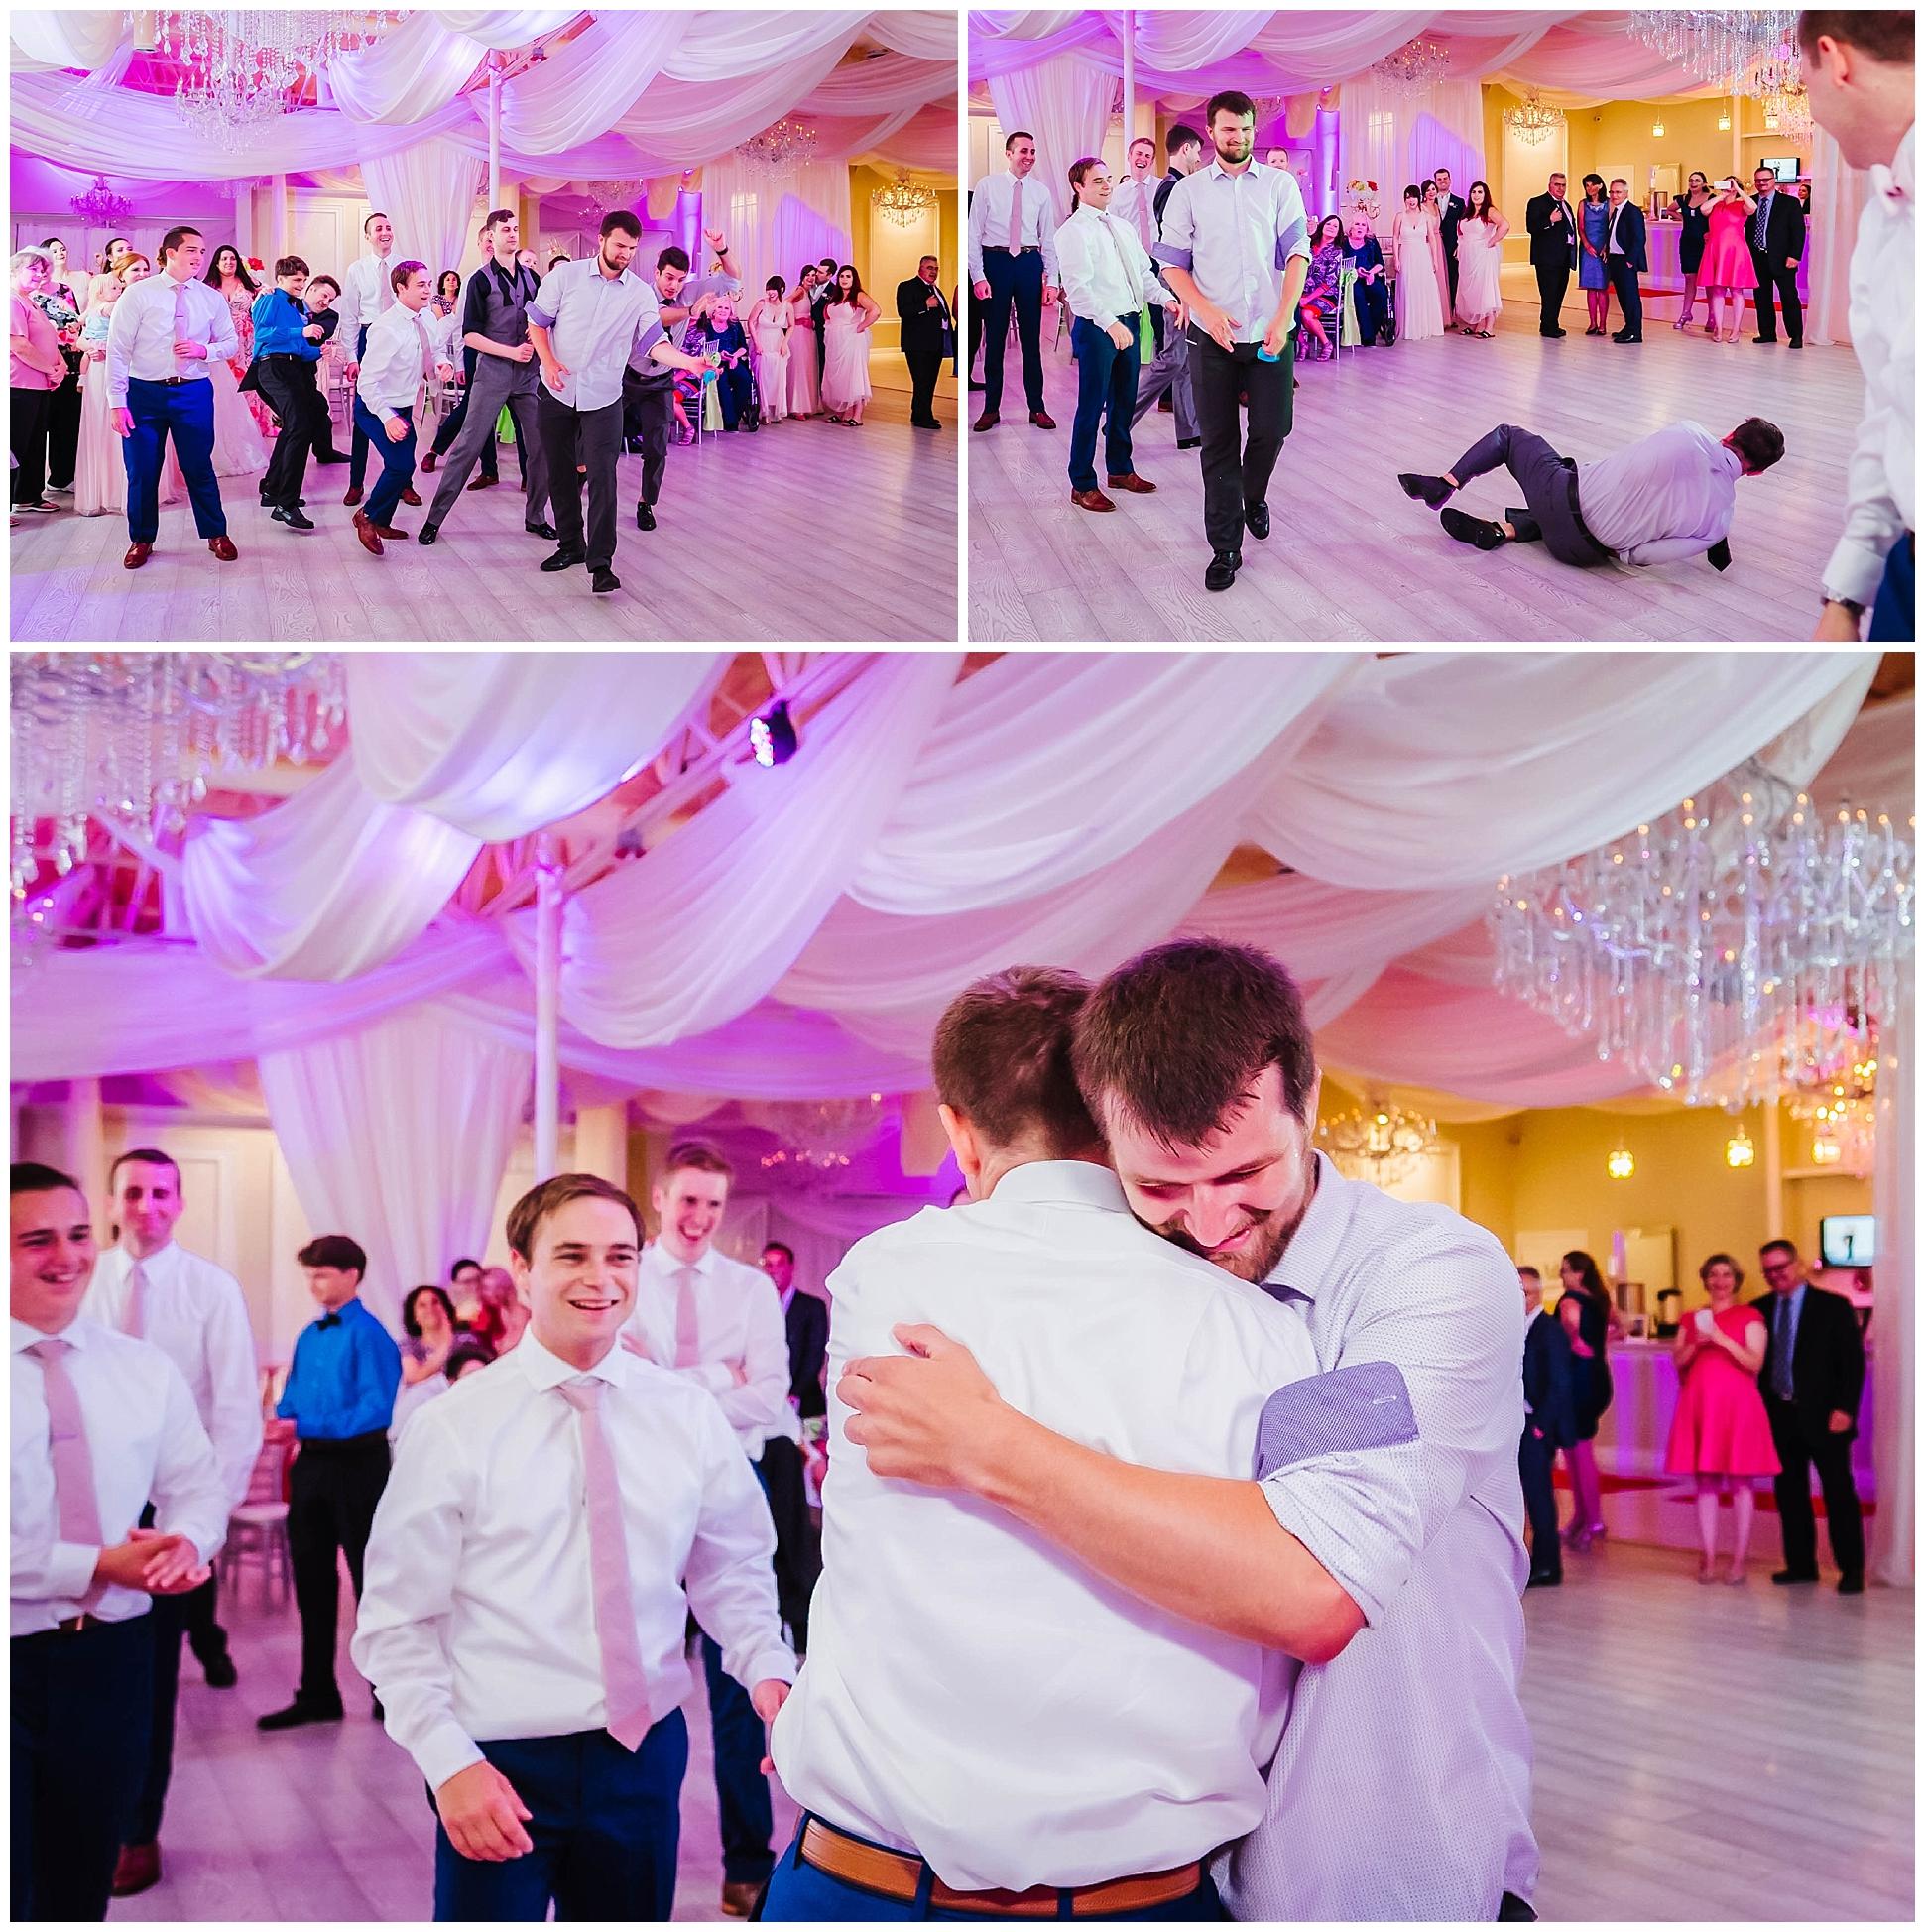 st-pete-wedding-photographer-sunken-gardens-crystal-ballroom-princess-dancer_0206.jpg